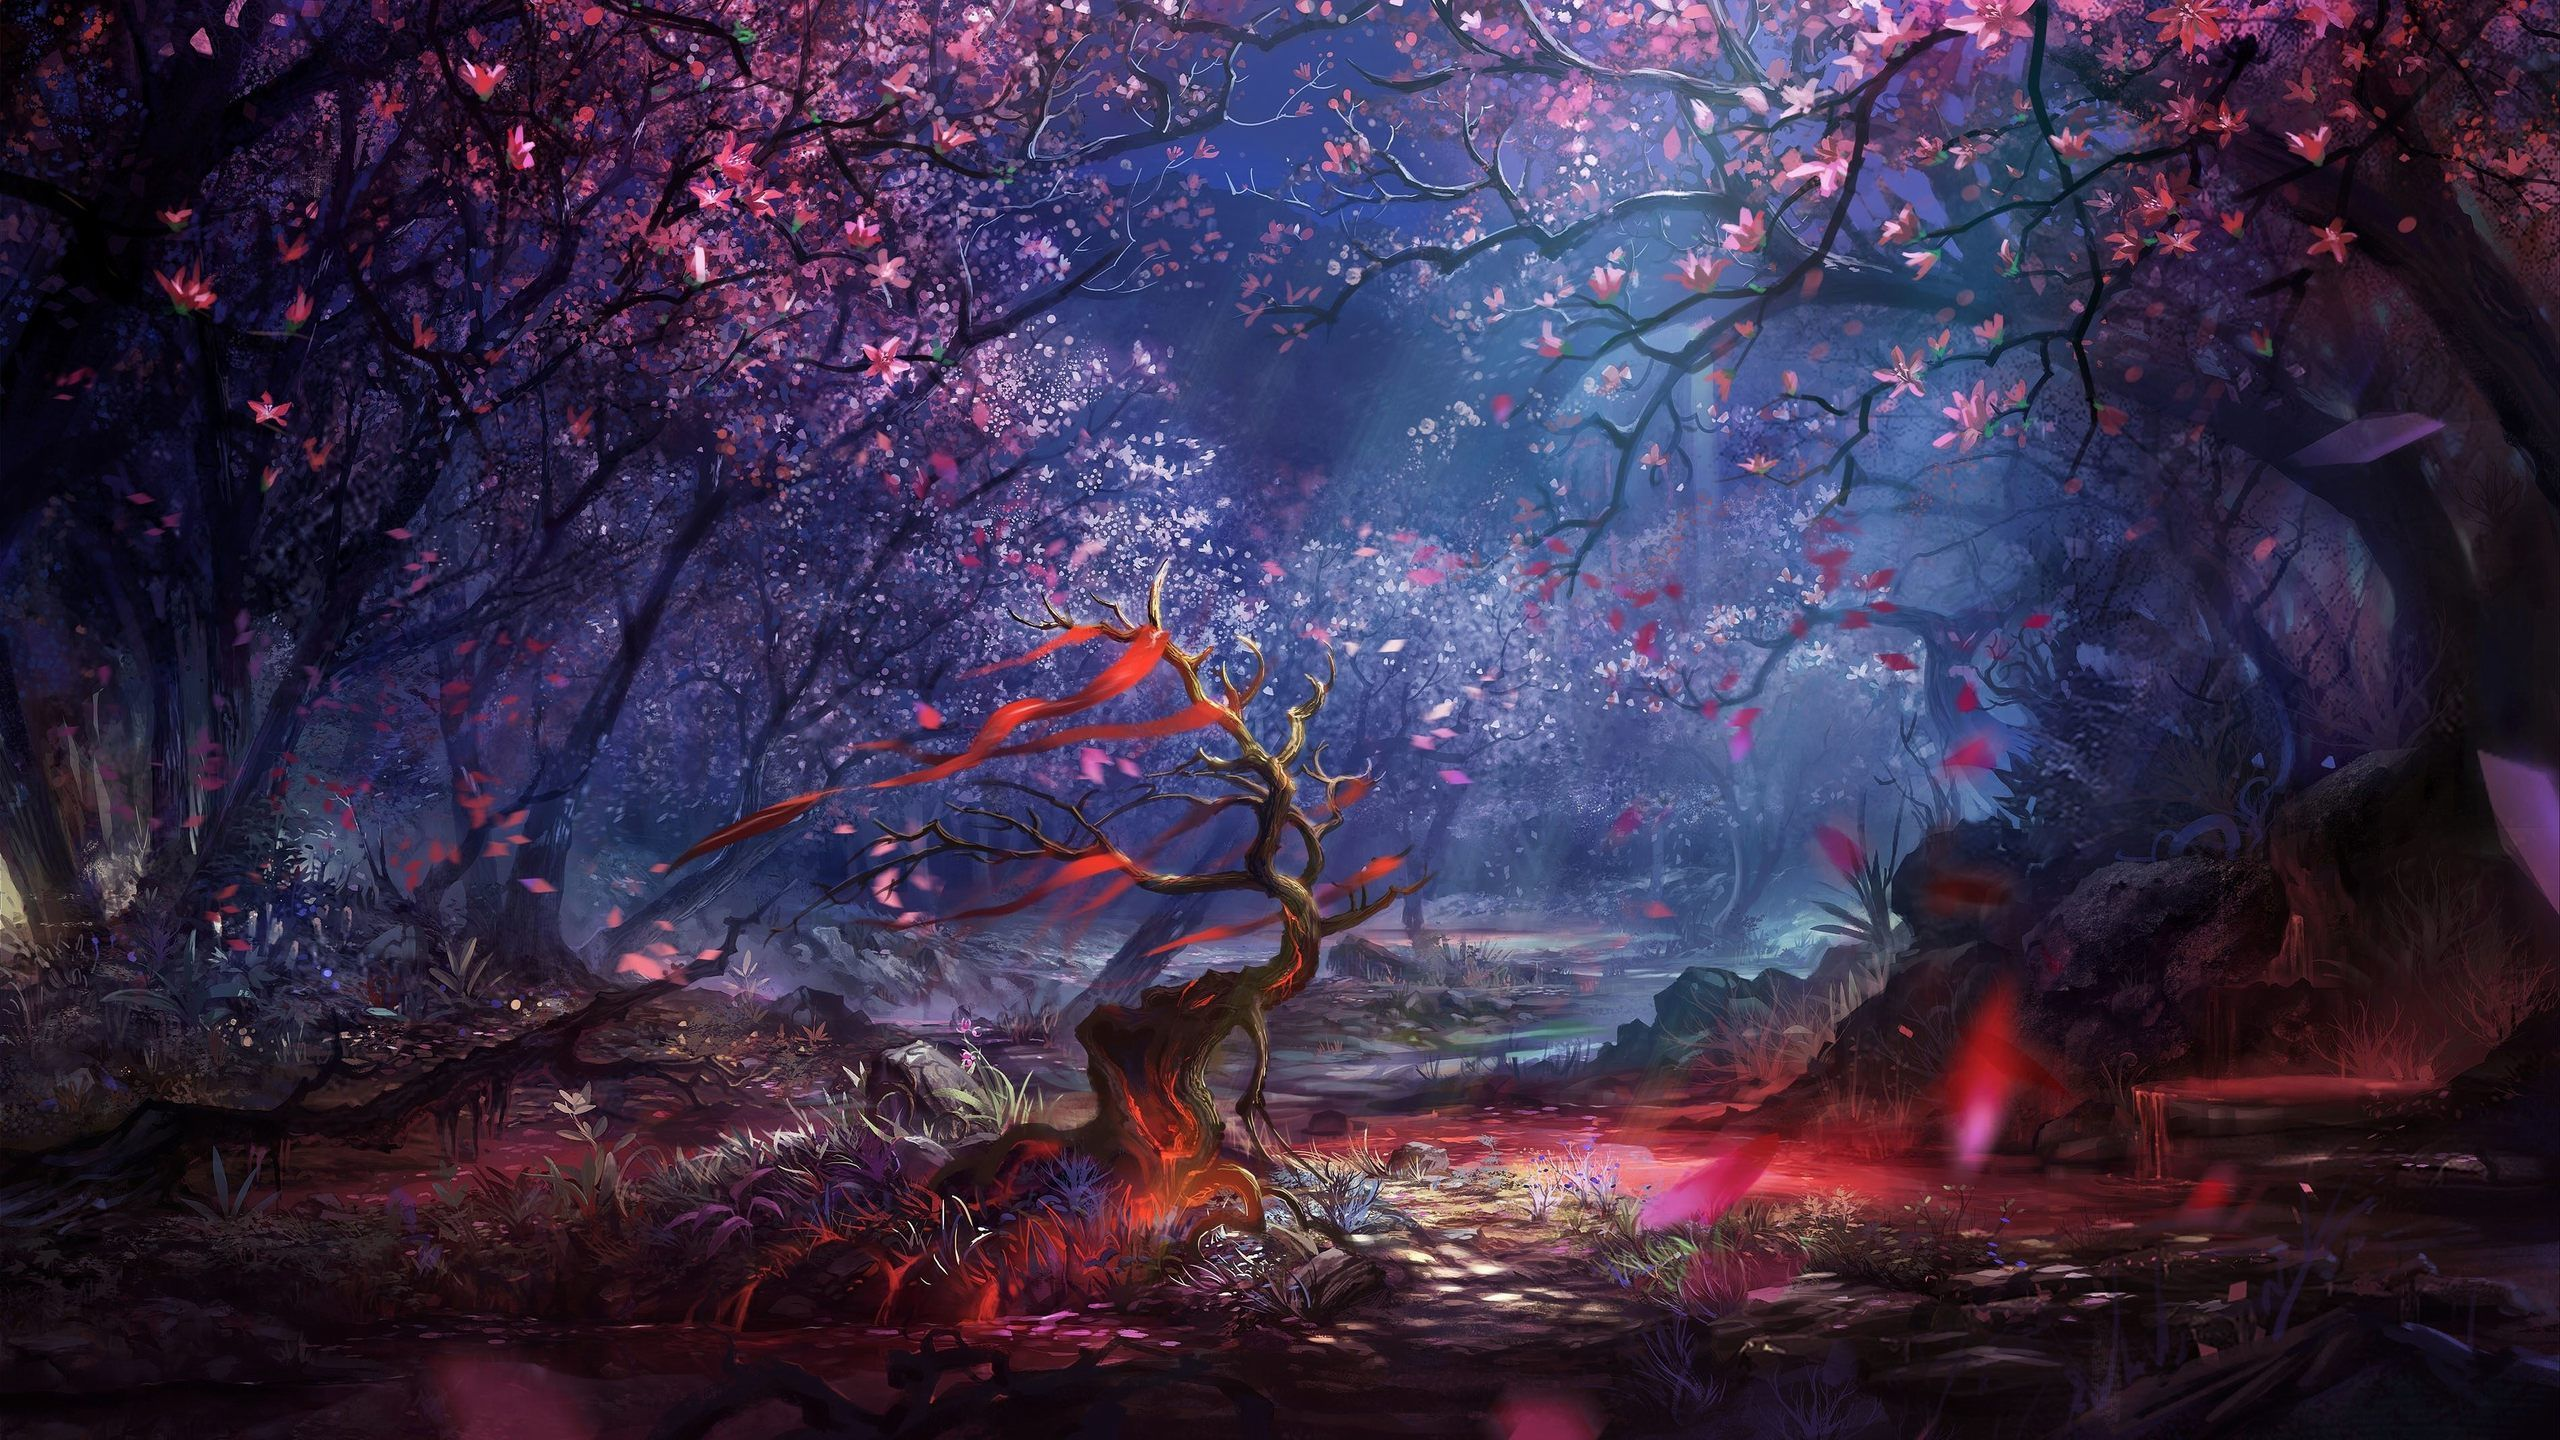 Pin By Patrick Tanner On Fantasy Fantasy Landscape Fantasy Forest Forest Art